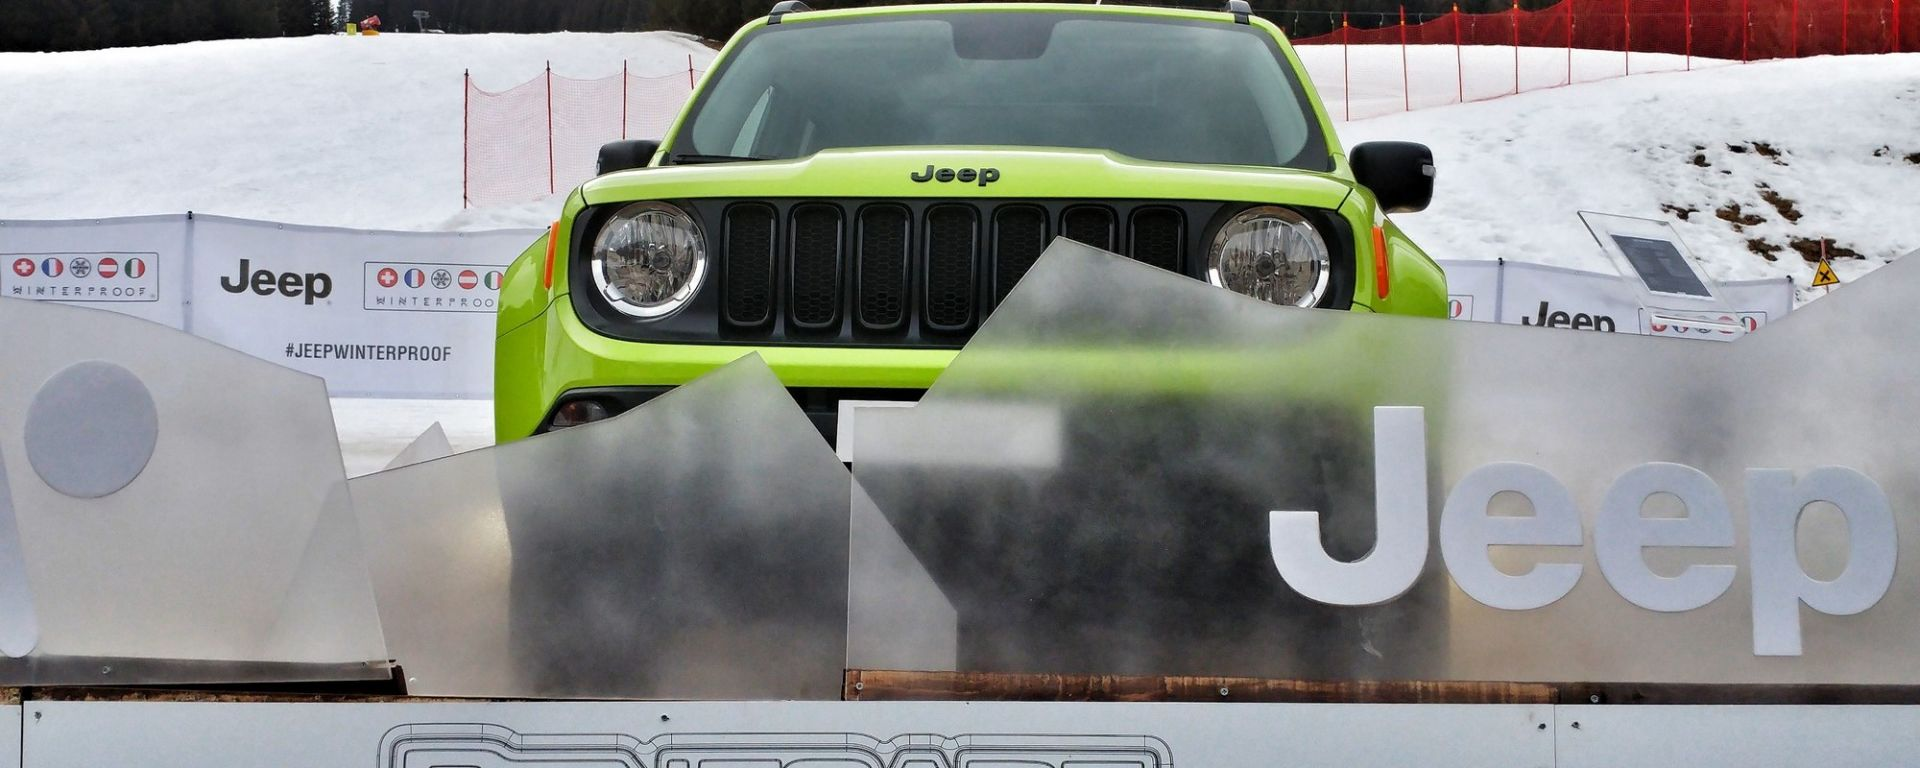 Jeep Renegade Upland, debutto al Jeep Winterproof Tour 2017